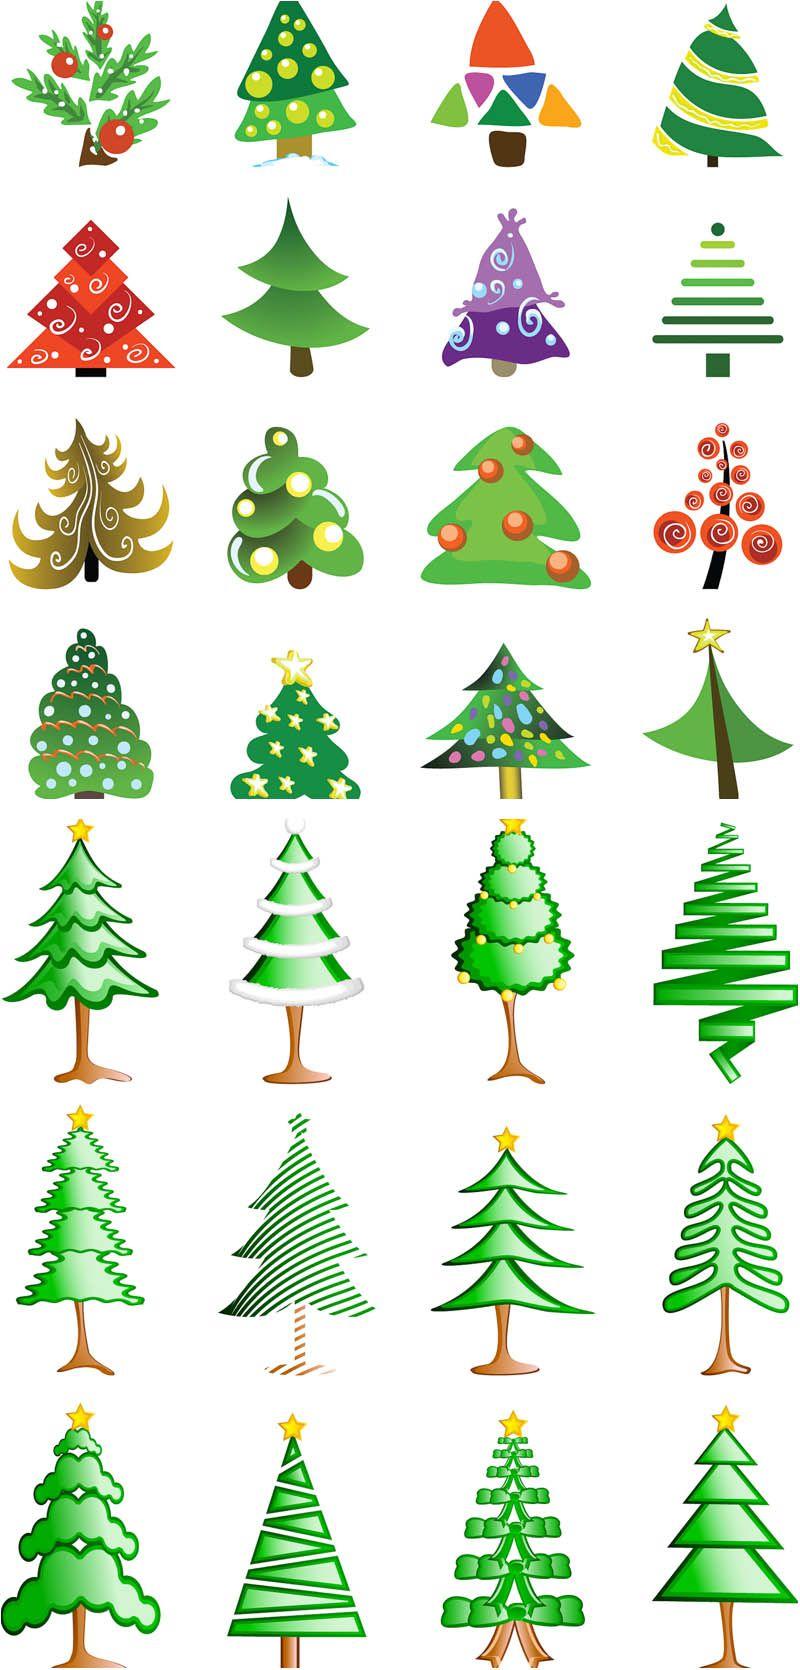 2 Sets of 28 vector Christmas tree logotypes in cartoon